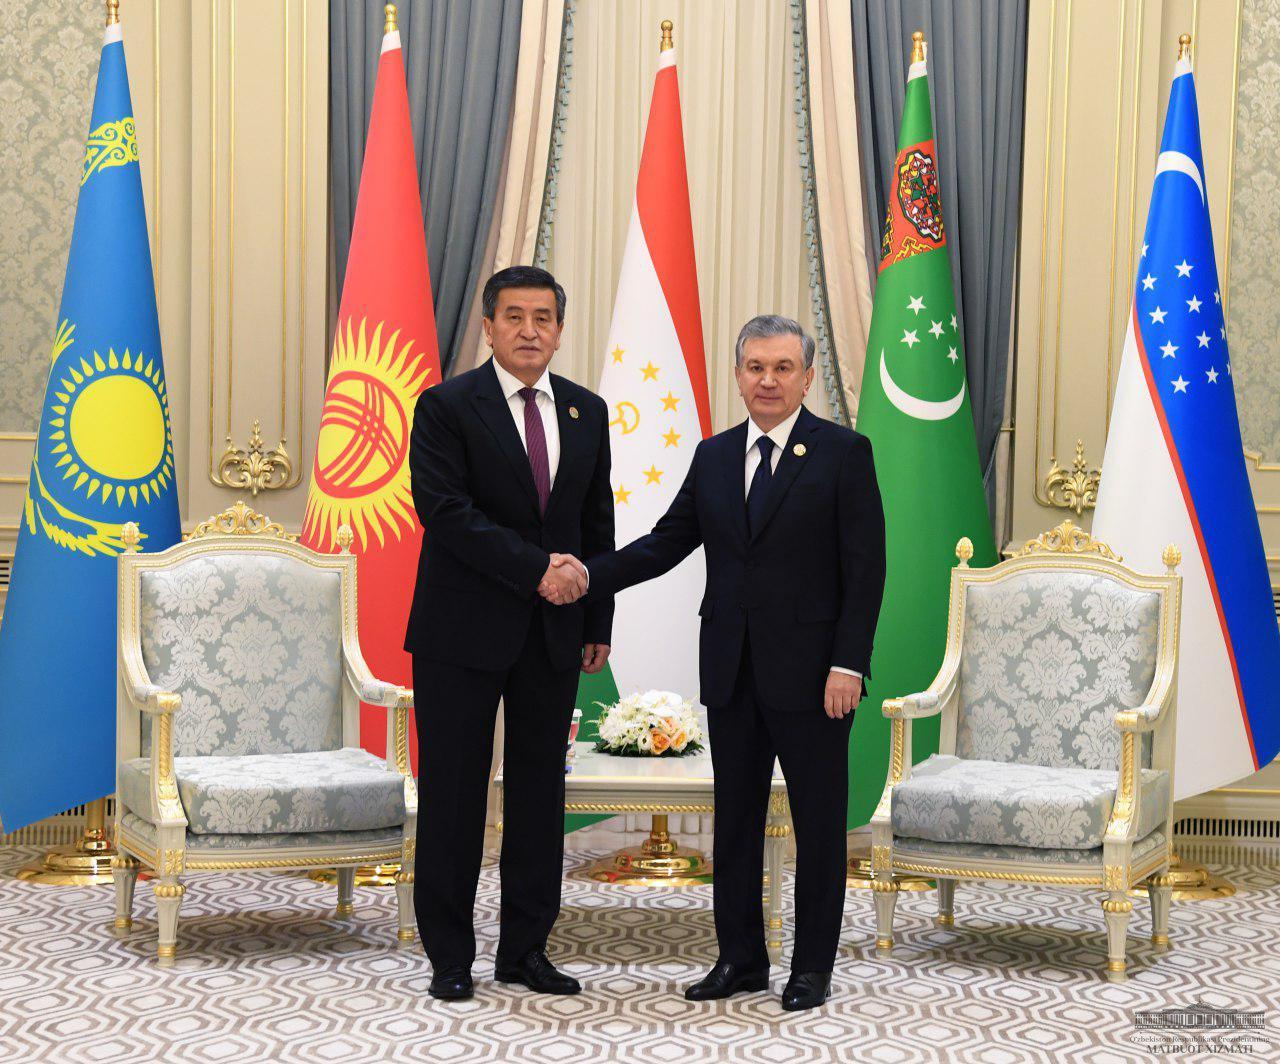 Президент Узбекистана провел встречи с лидерами Кыргызстана и Таджикистана